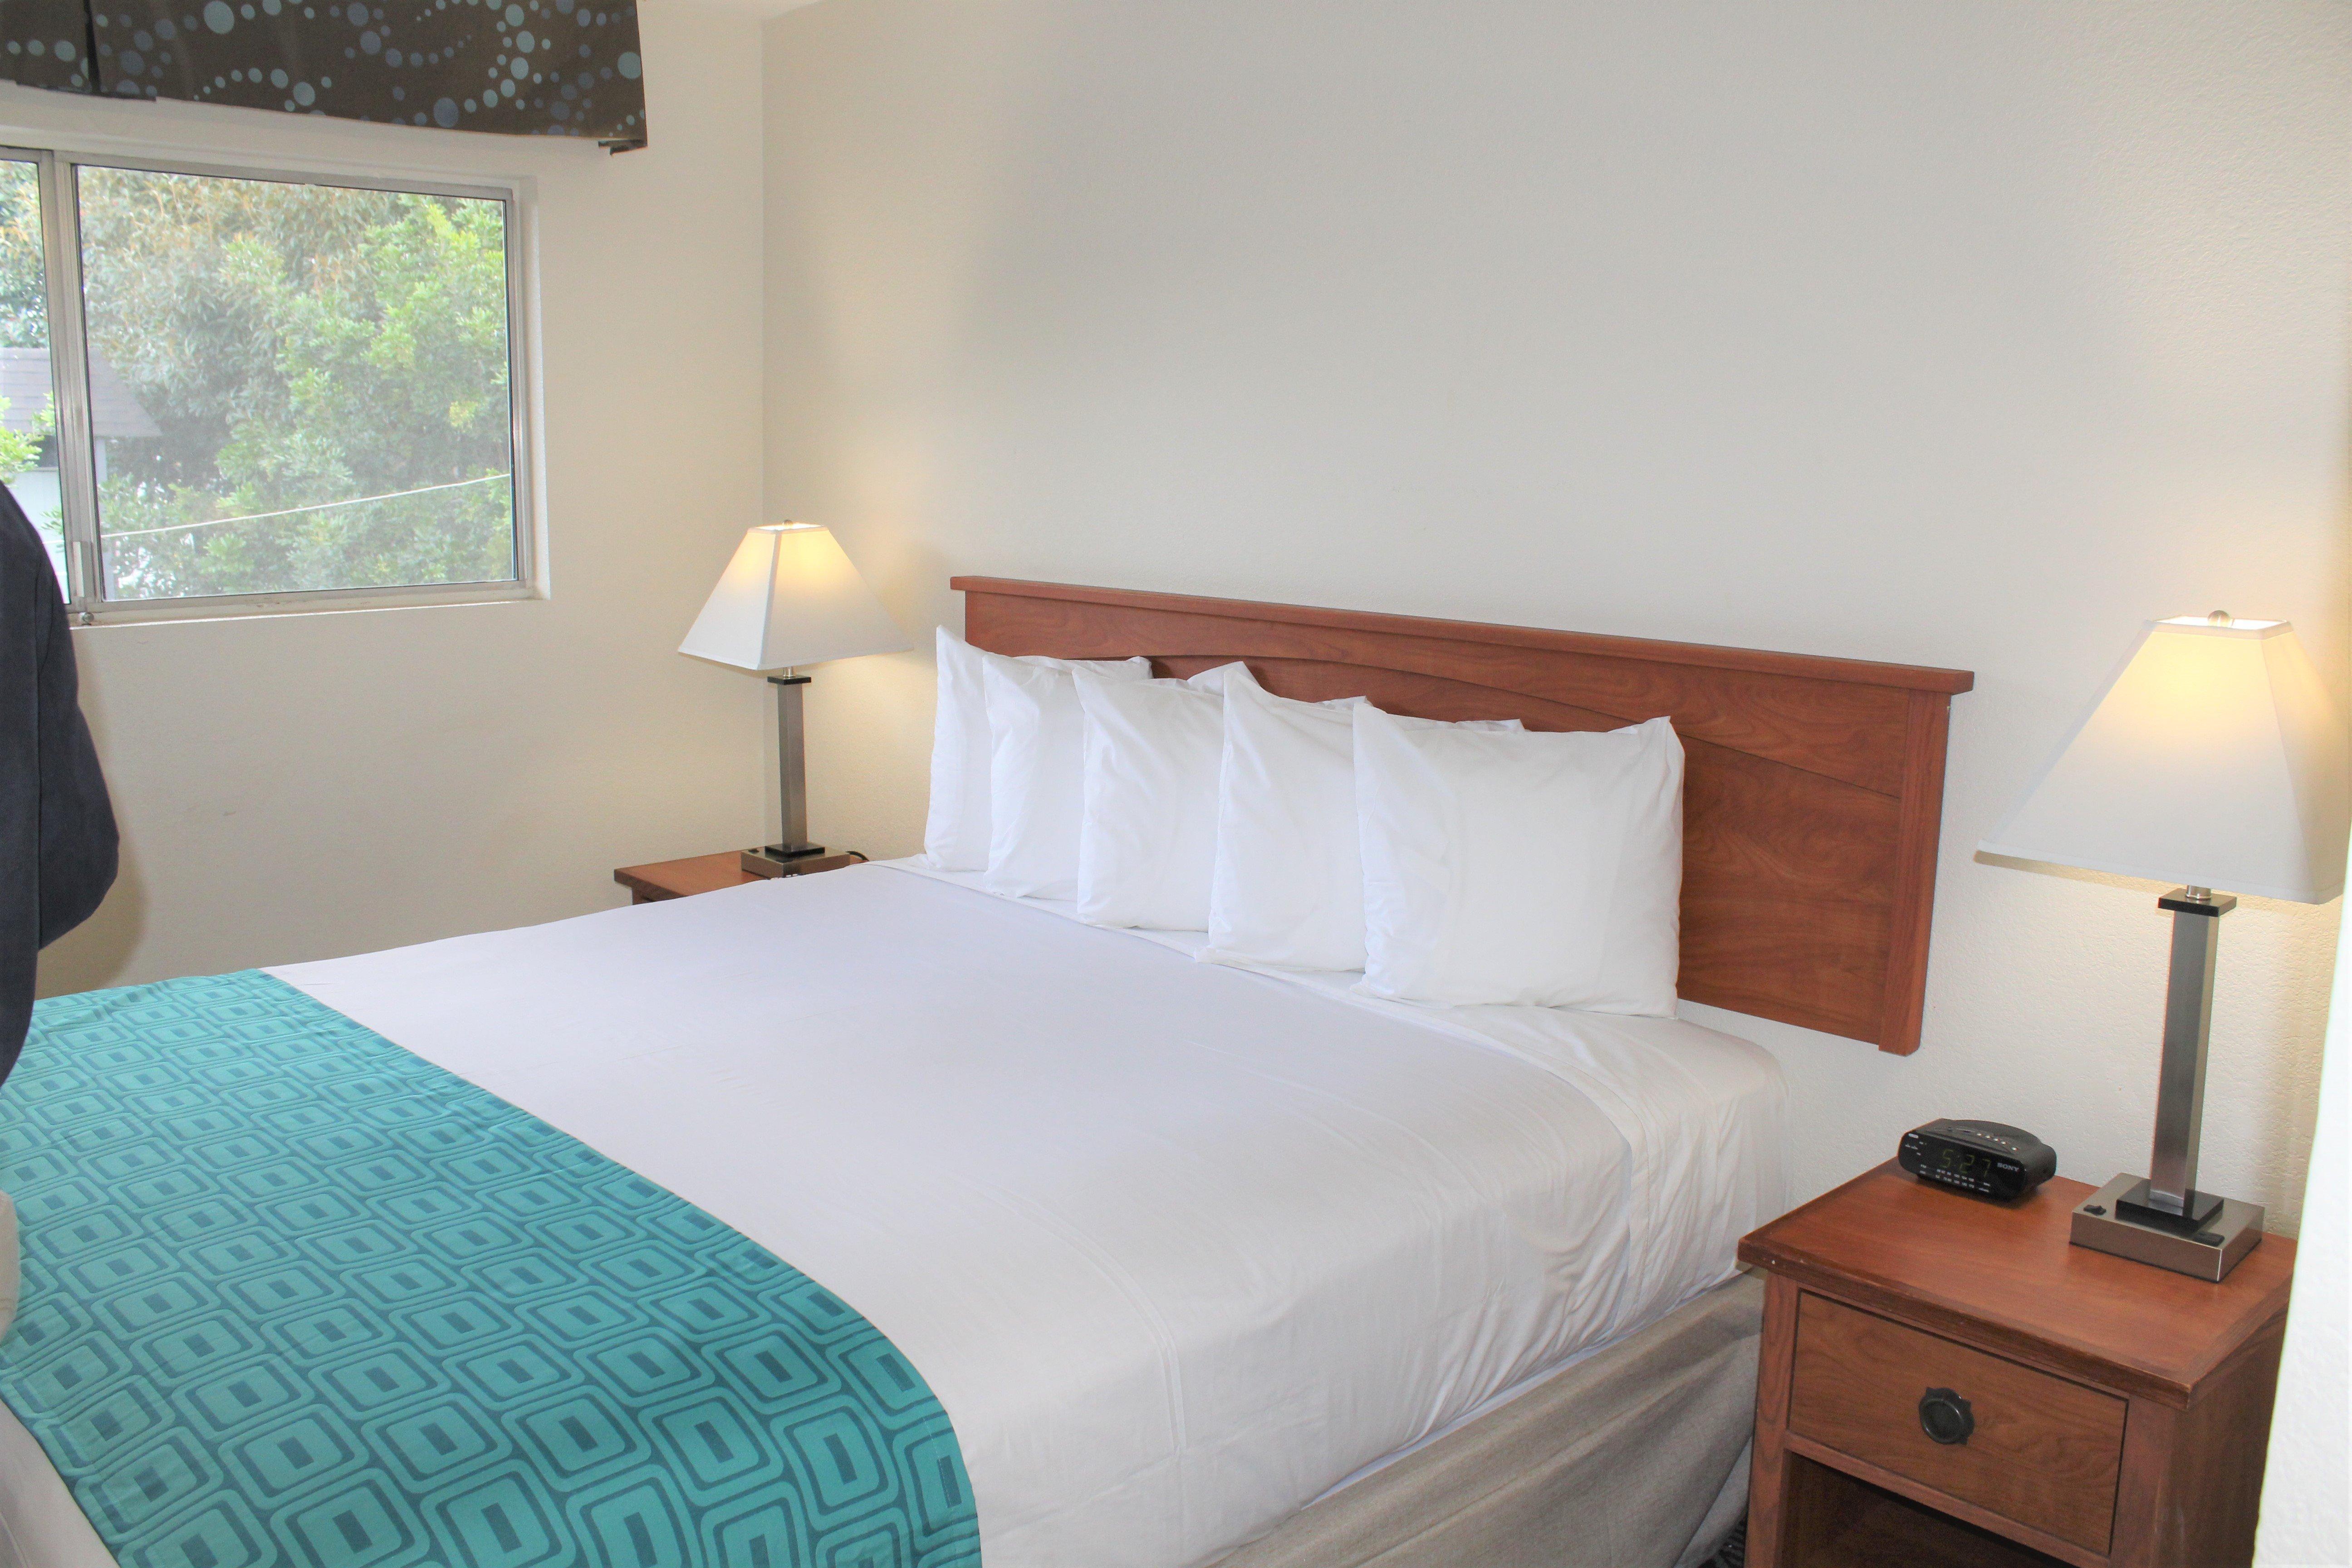 Howard Johnson by Wyndham Chula Vista San Diego Suite Hotel image 5